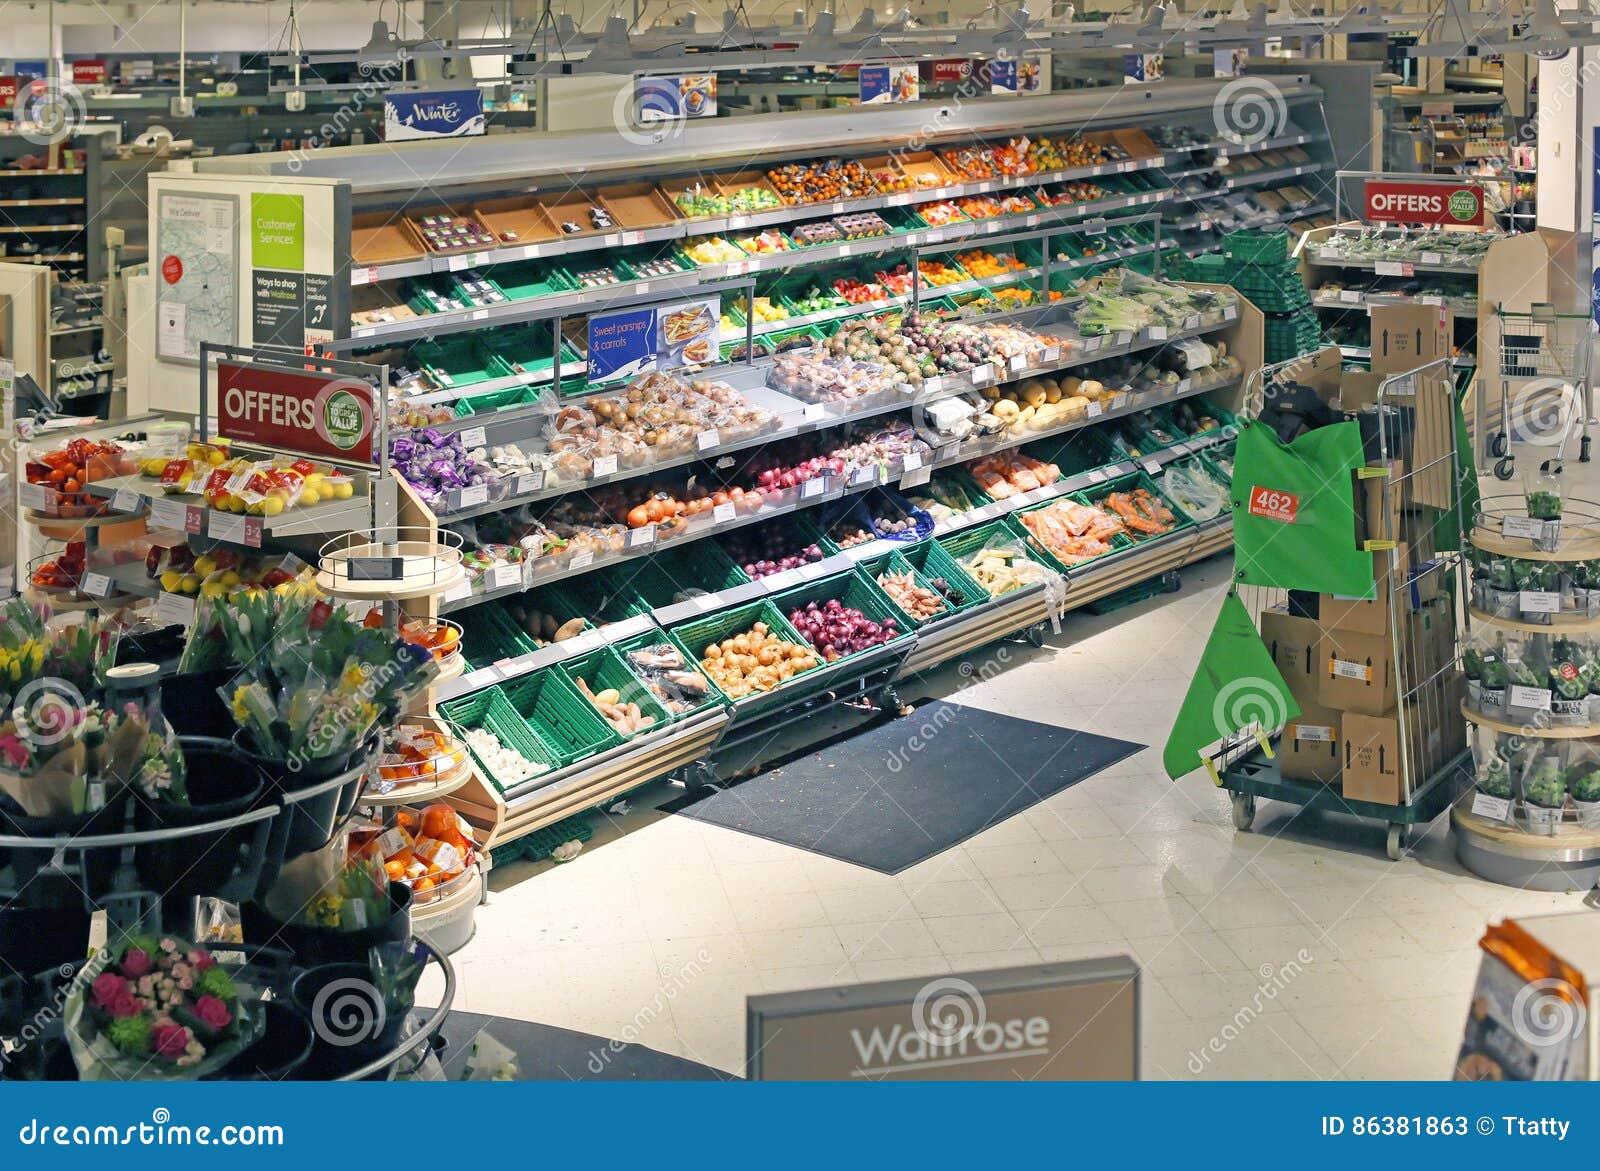 Waitrose Grocery Store Editorial Stock Photo Image Of Supermarket